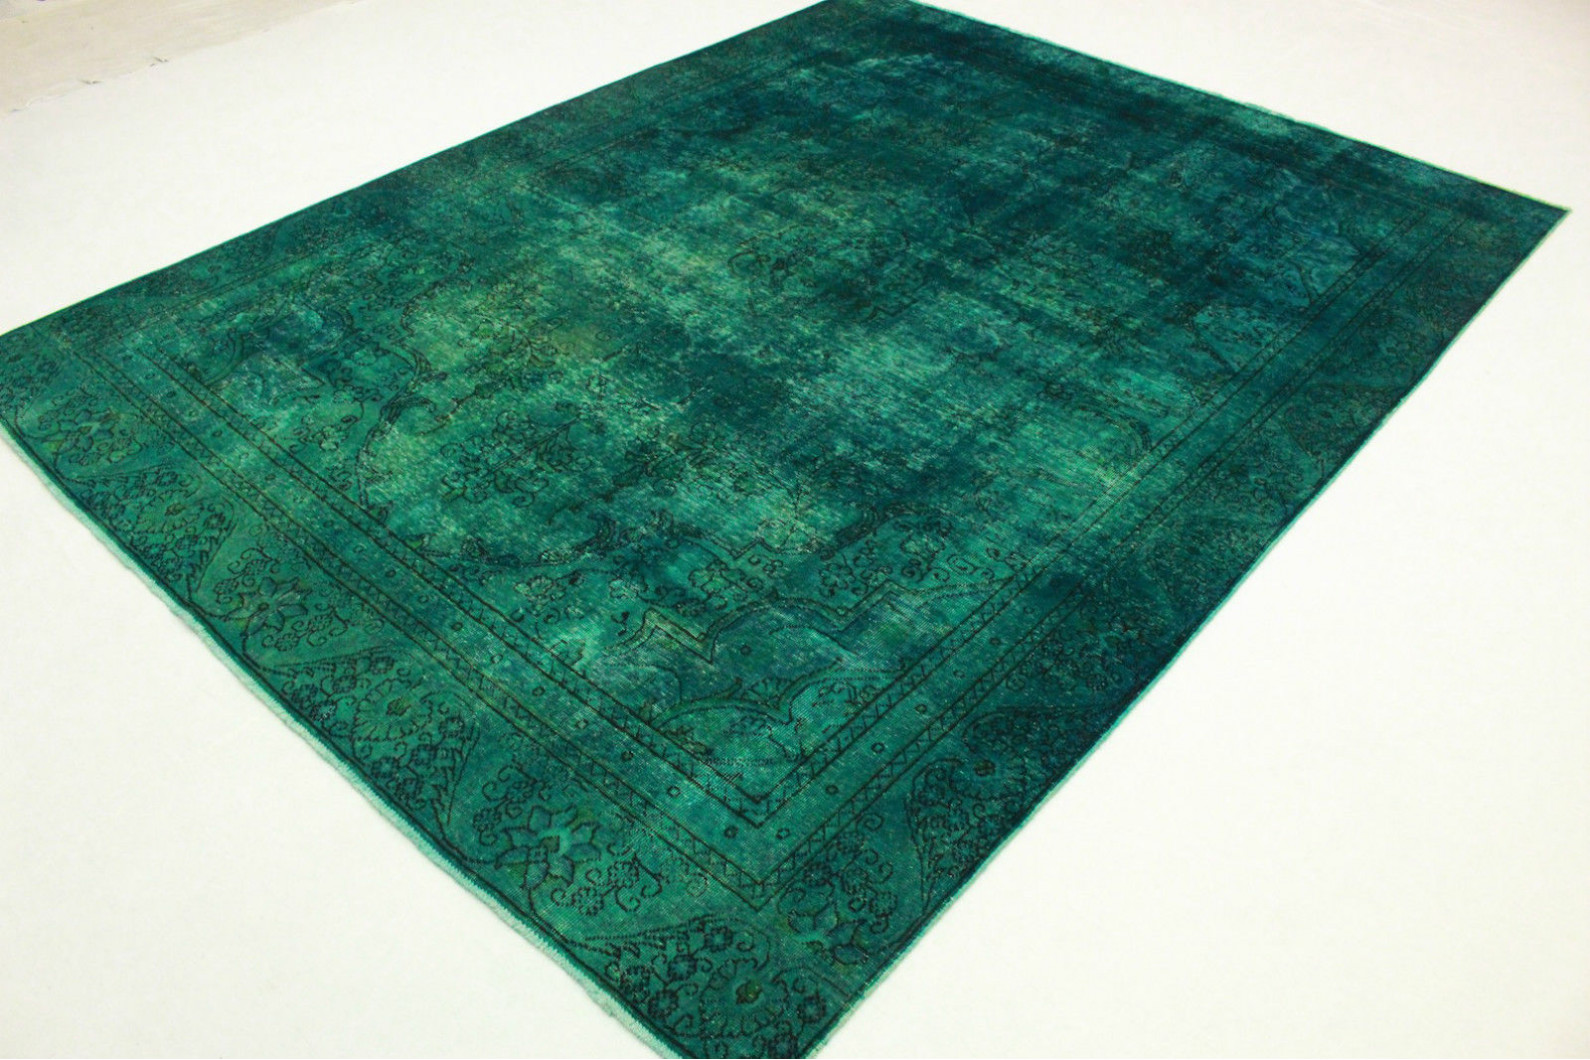 vintage teppich t rkis in 360x270cm 1001 3347 bei kaufen. Black Bedroom Furniture Sets. Home Design Ideas